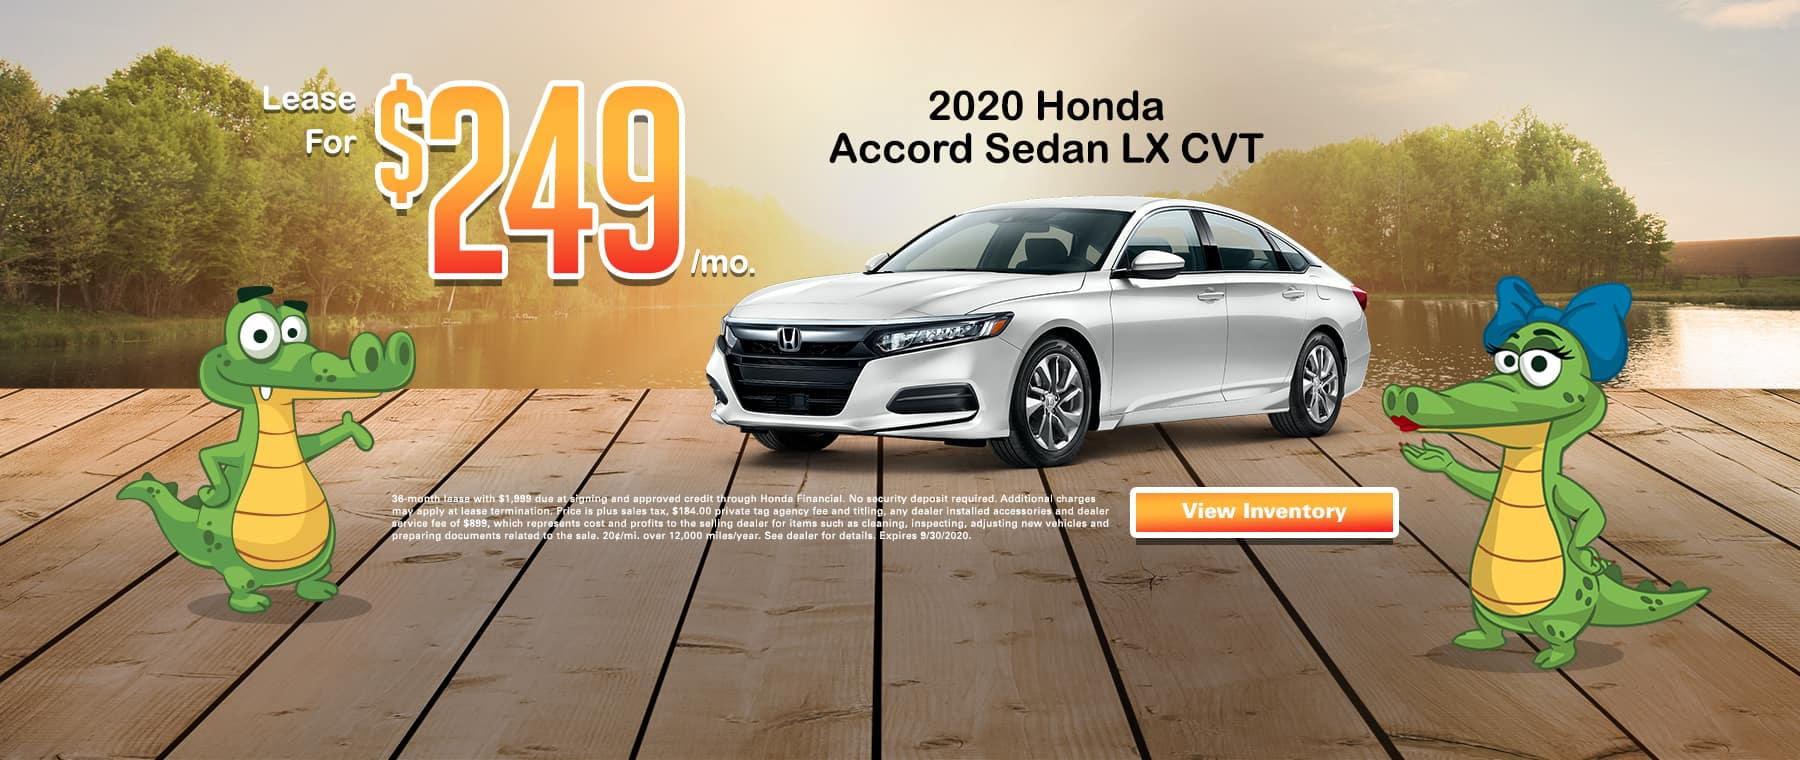 New 2020 Honda Accord Sedan LX CVT | Lease For $249 Per Mo